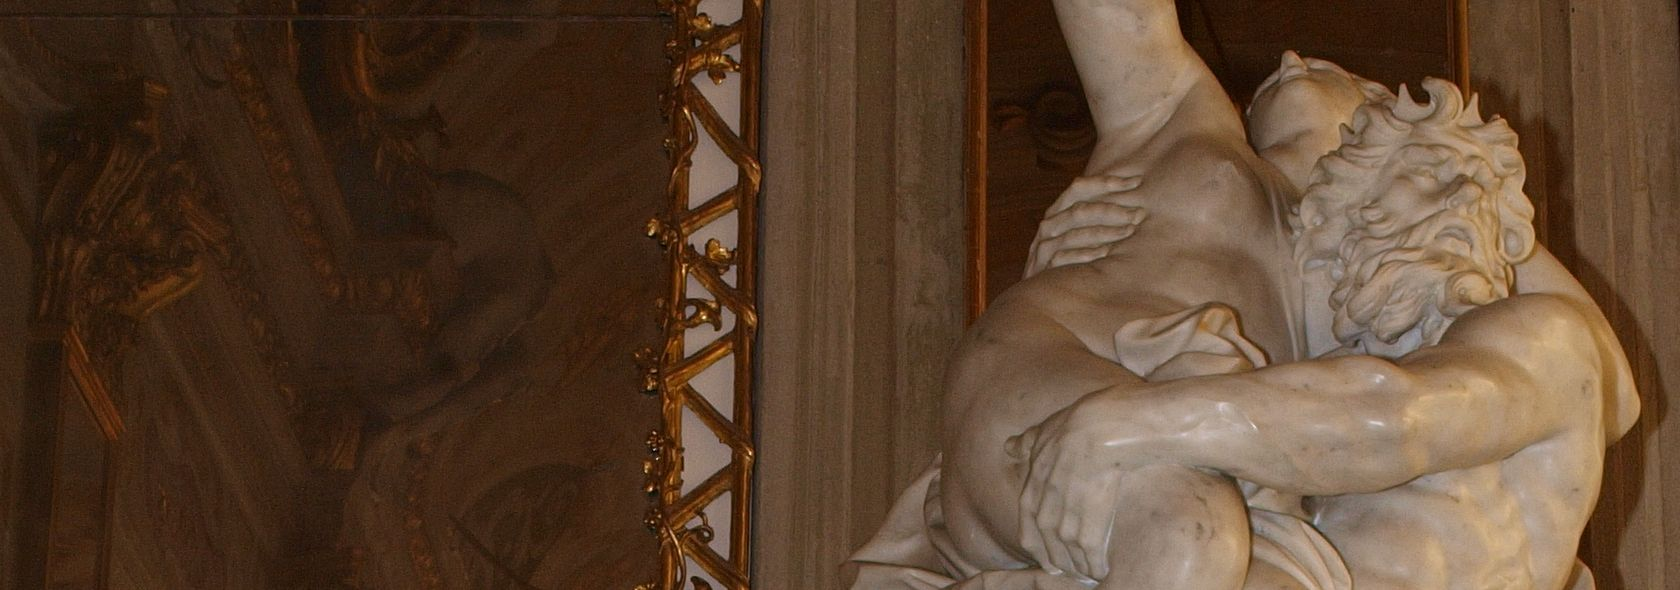 Francesco Maria Schiaffino - Ratto di Proserpina - ©Enrico Monaci